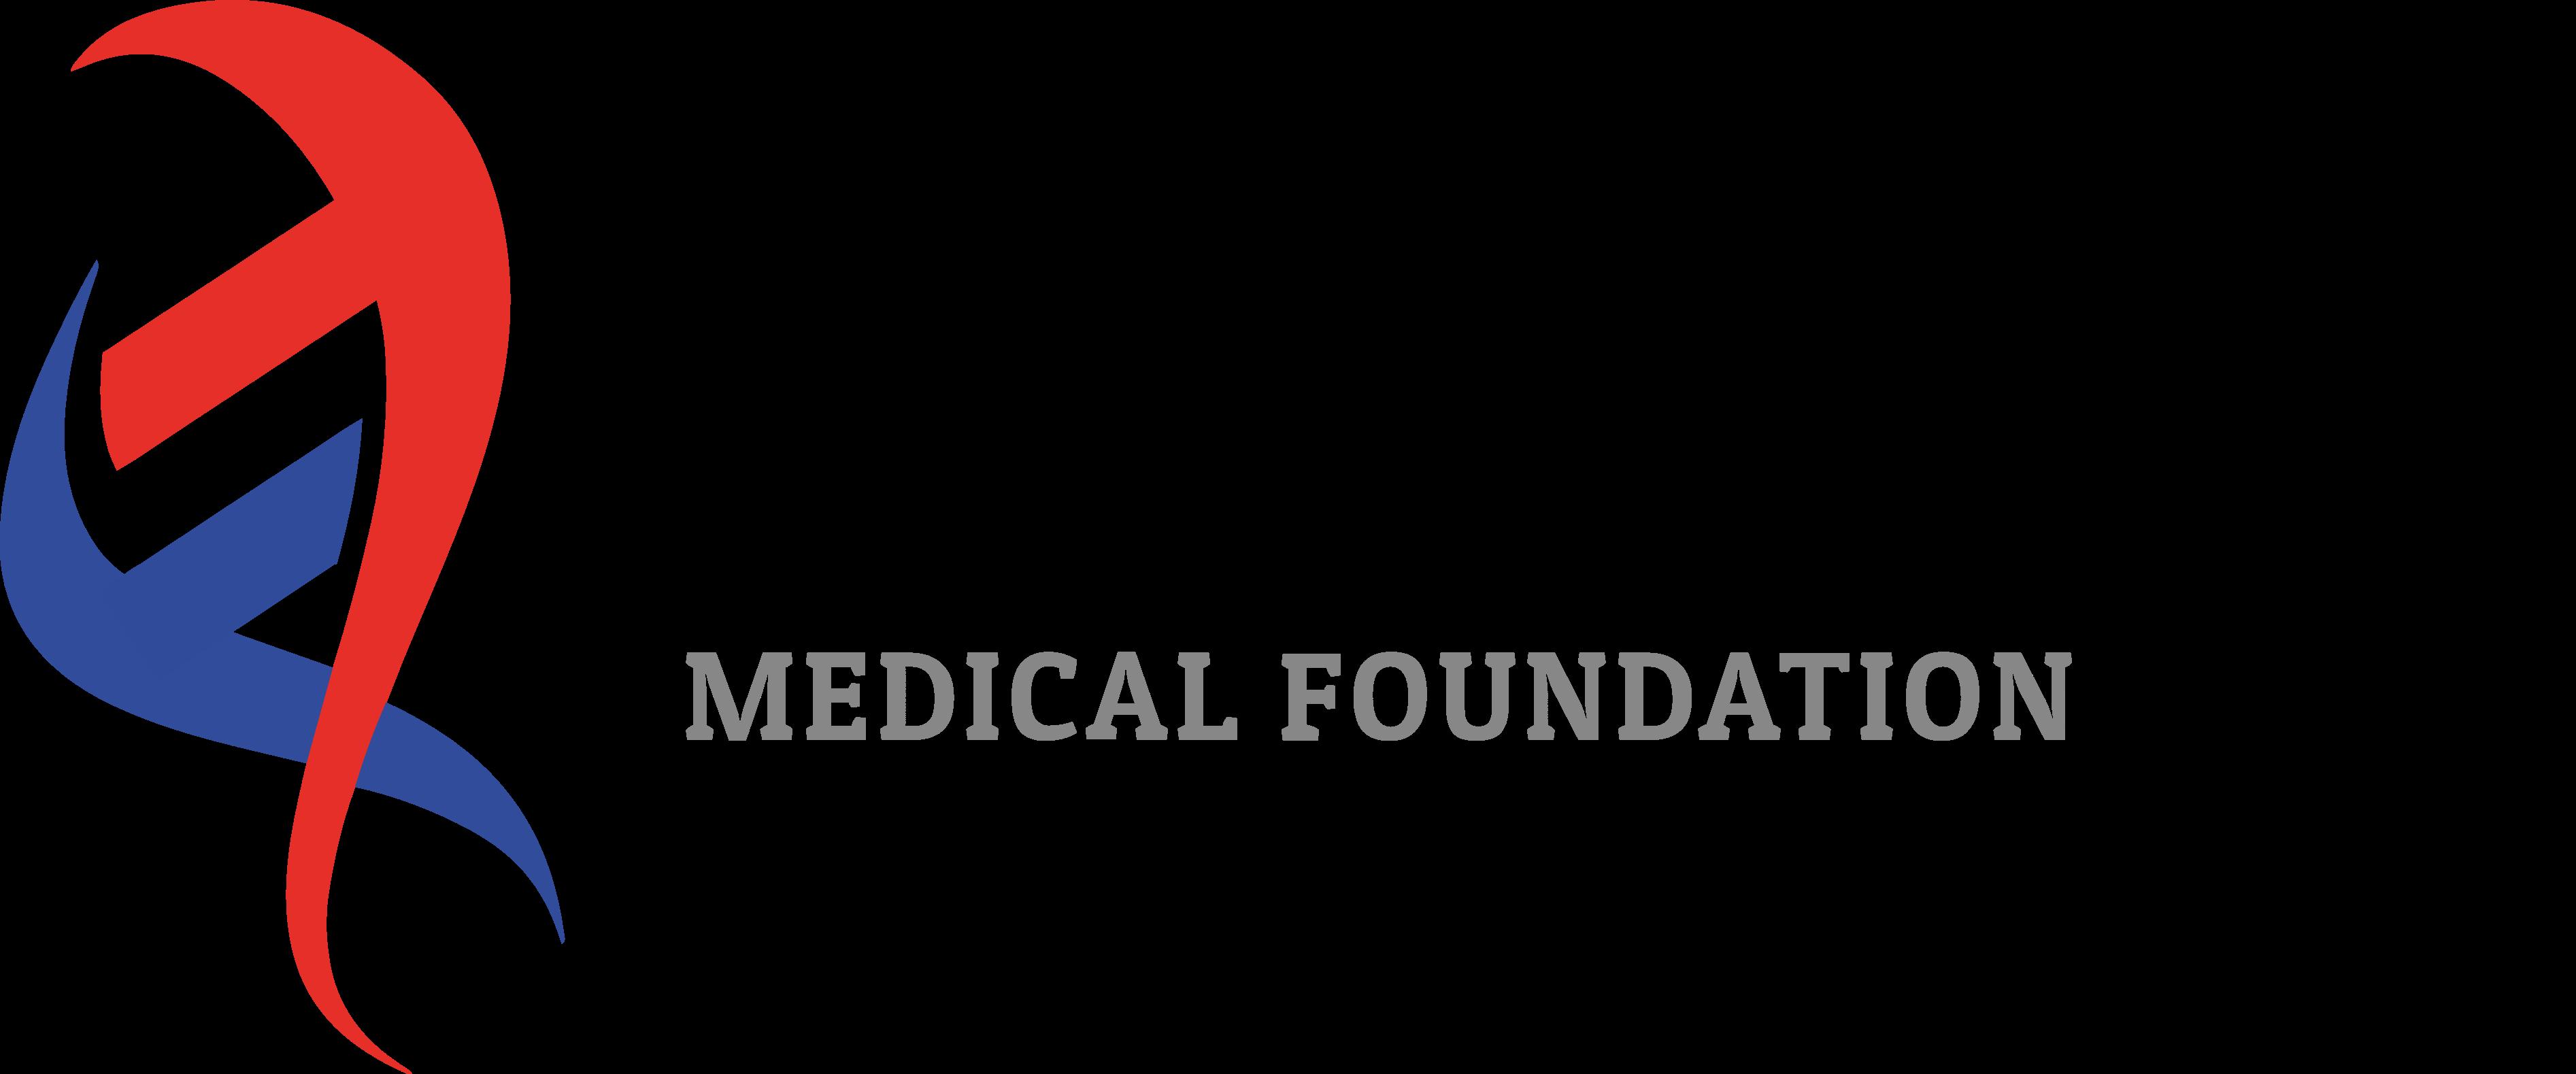 Hartwig Medical Foundation - Logos Download